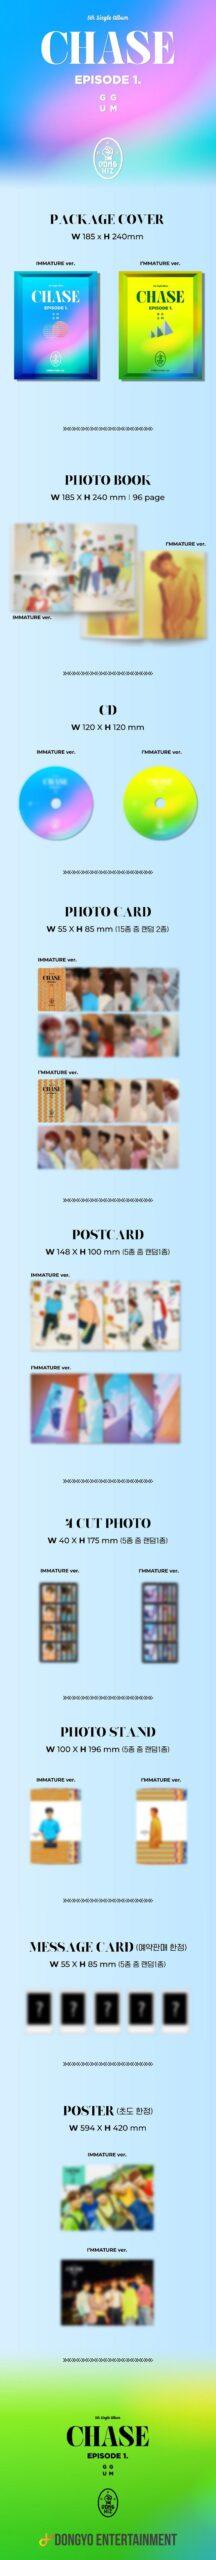 5th Single de DONGKIZ CHASE EPISODE 1. GGUM IM MATURE Ver. o IMMATURE Ver. Poster 1